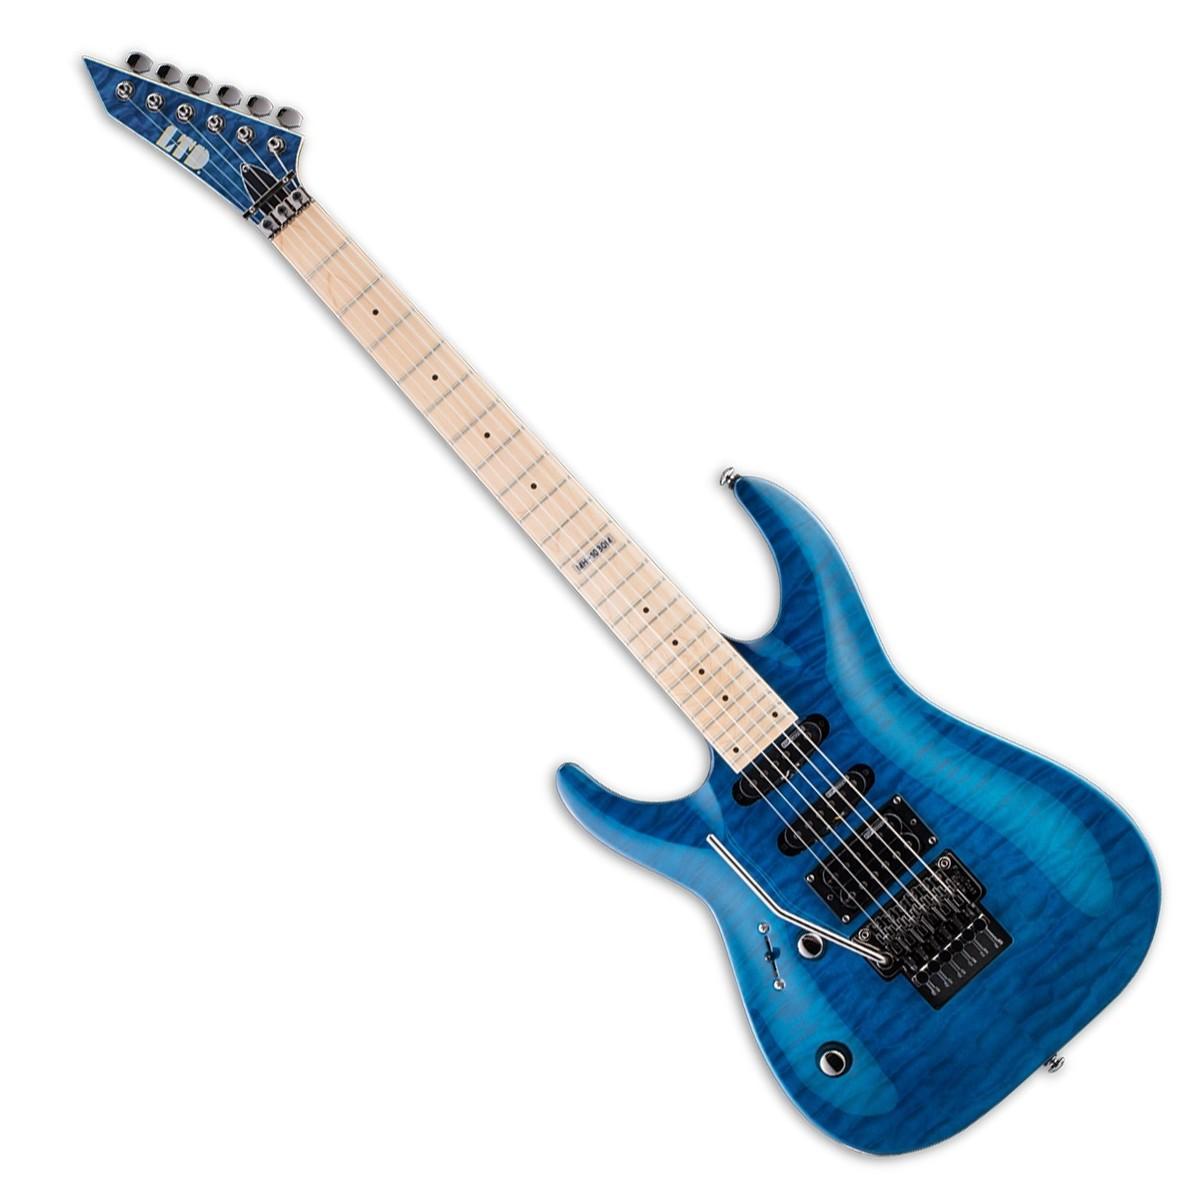 esp ltd mh 103qm electric guitar lh see thru blue at. Black Bedroom Furniture Sets. Home Design Ideas